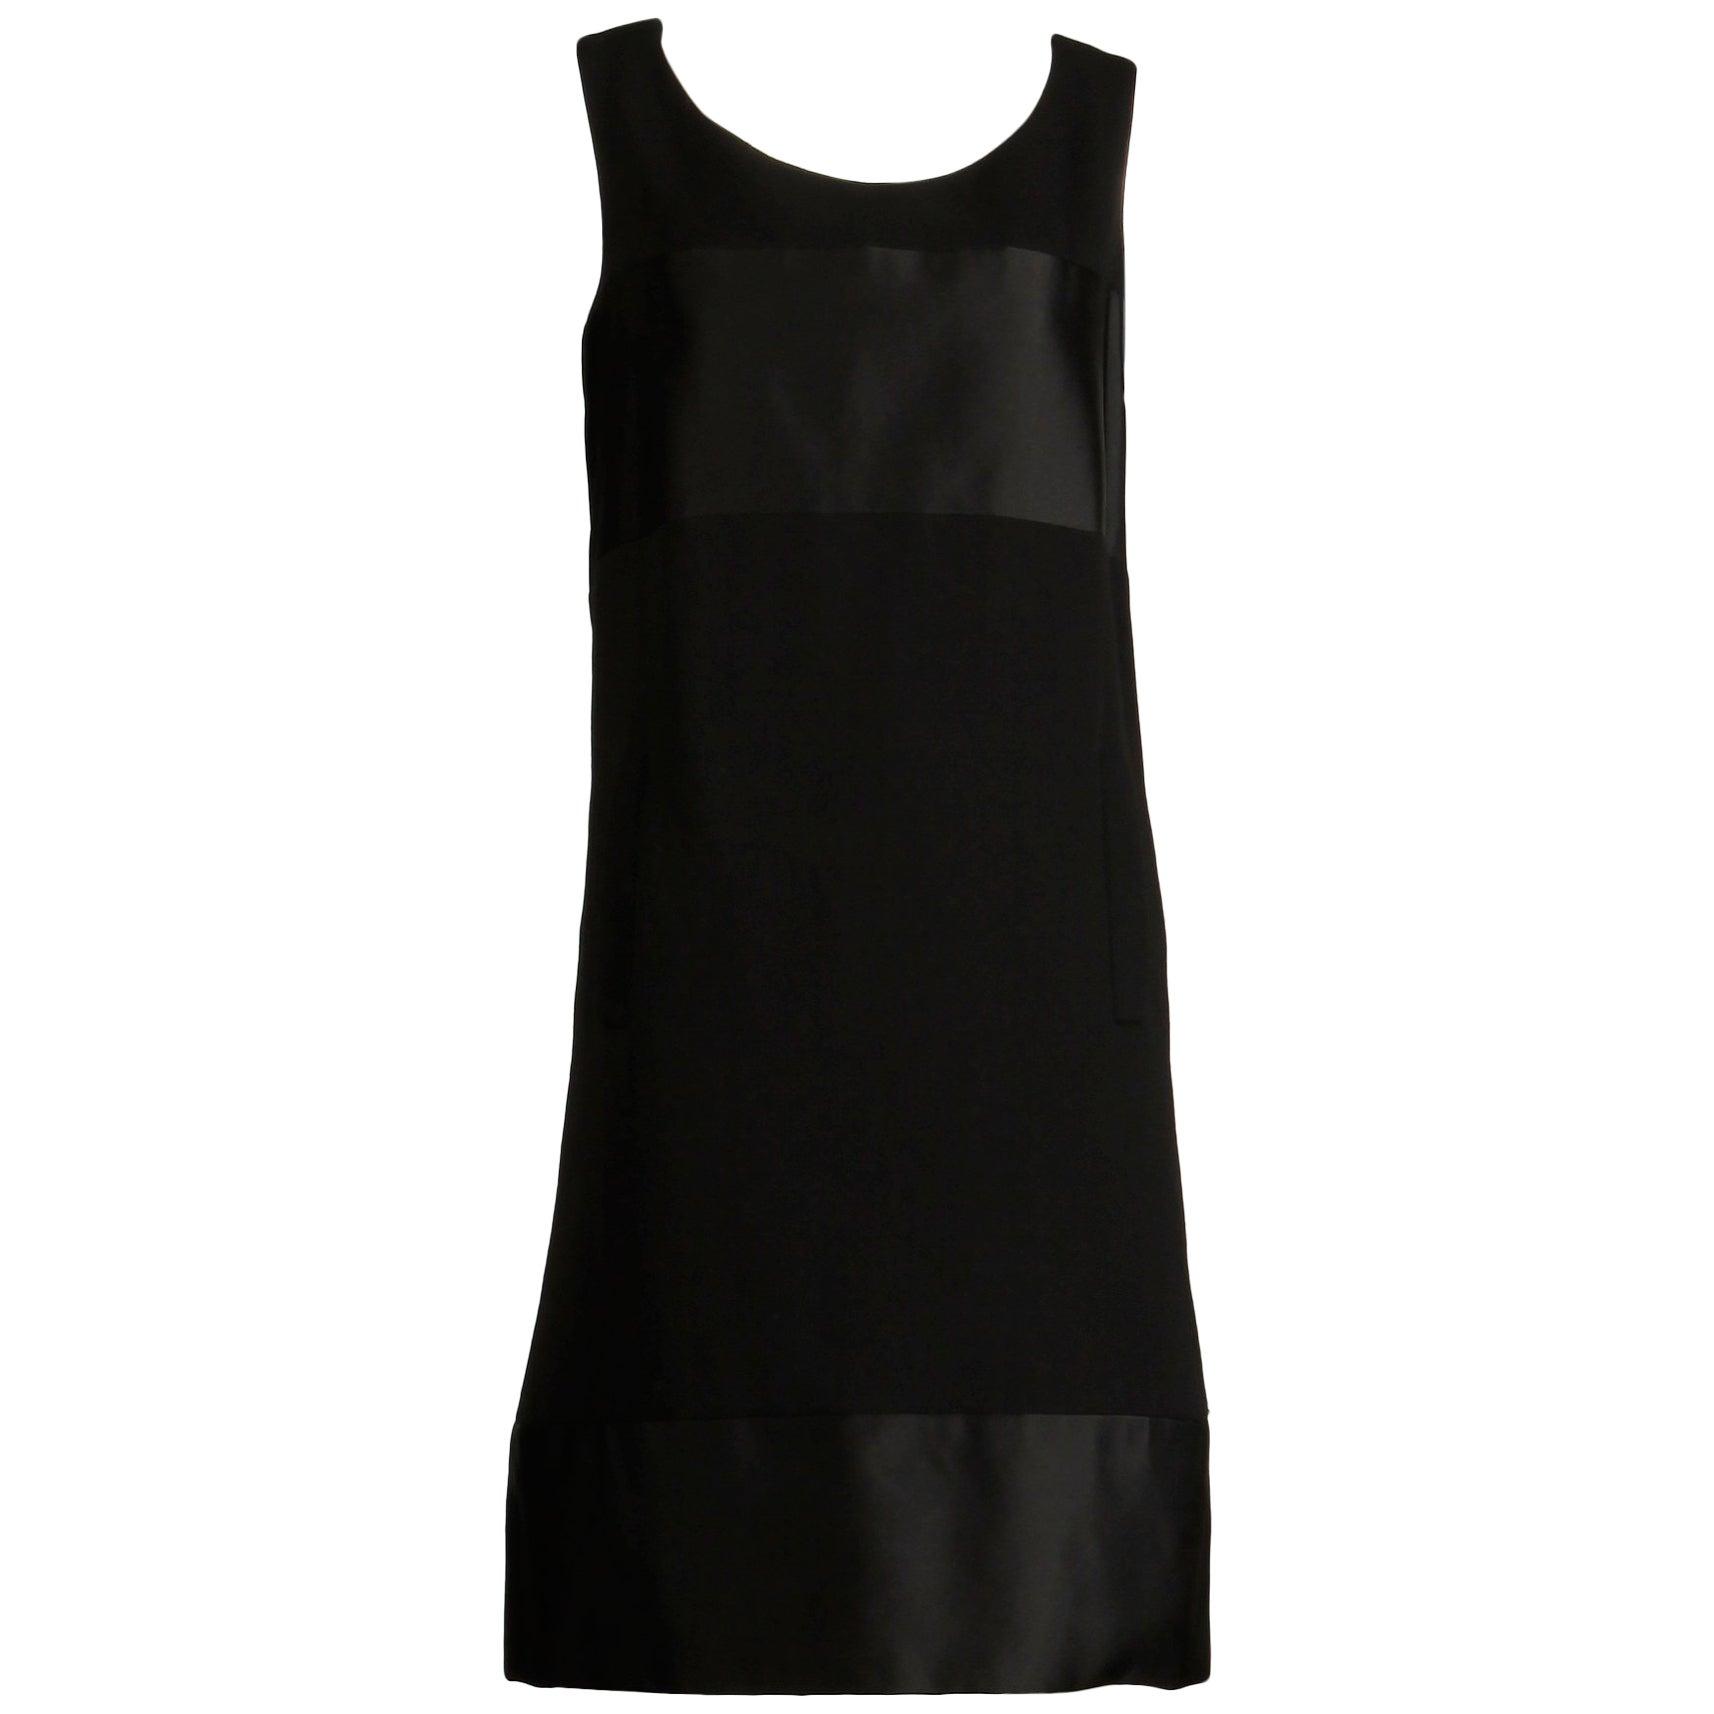 1960s Geoffrey Beene Vintage Black Wool + Silk Fabric Block Mod Shift Dress